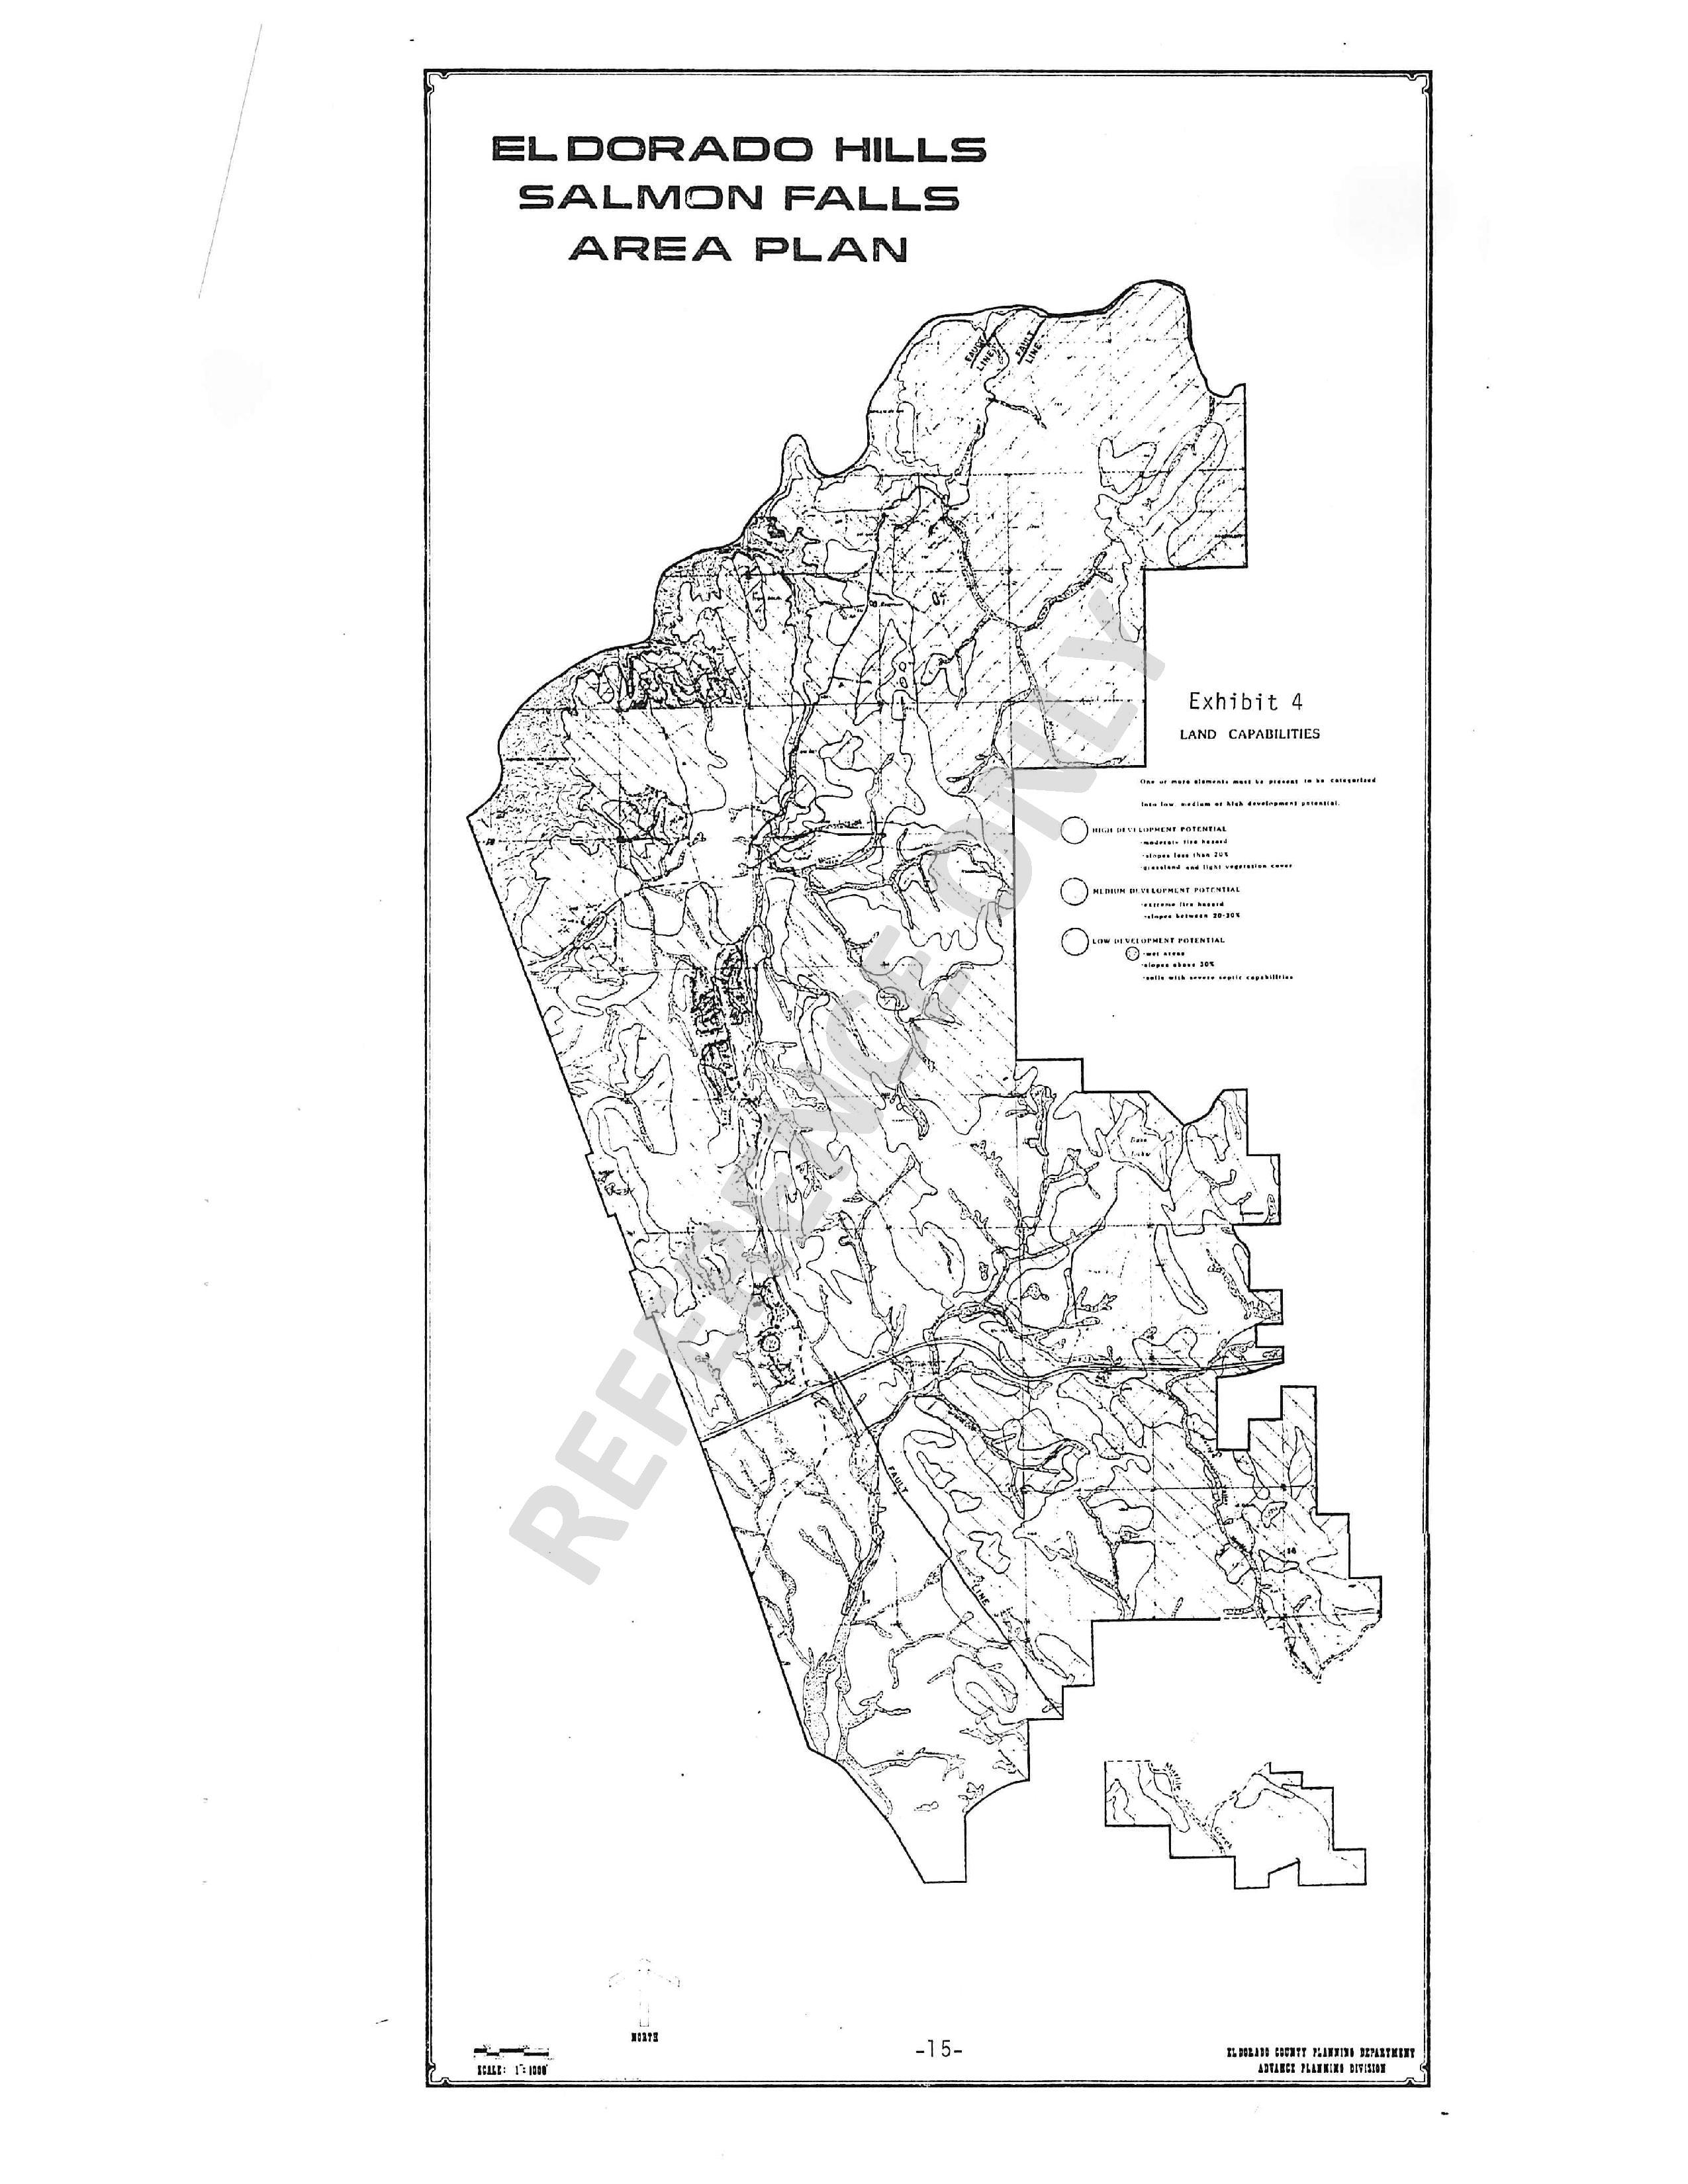 El Dorado Hills Salmon Falls Area Plan